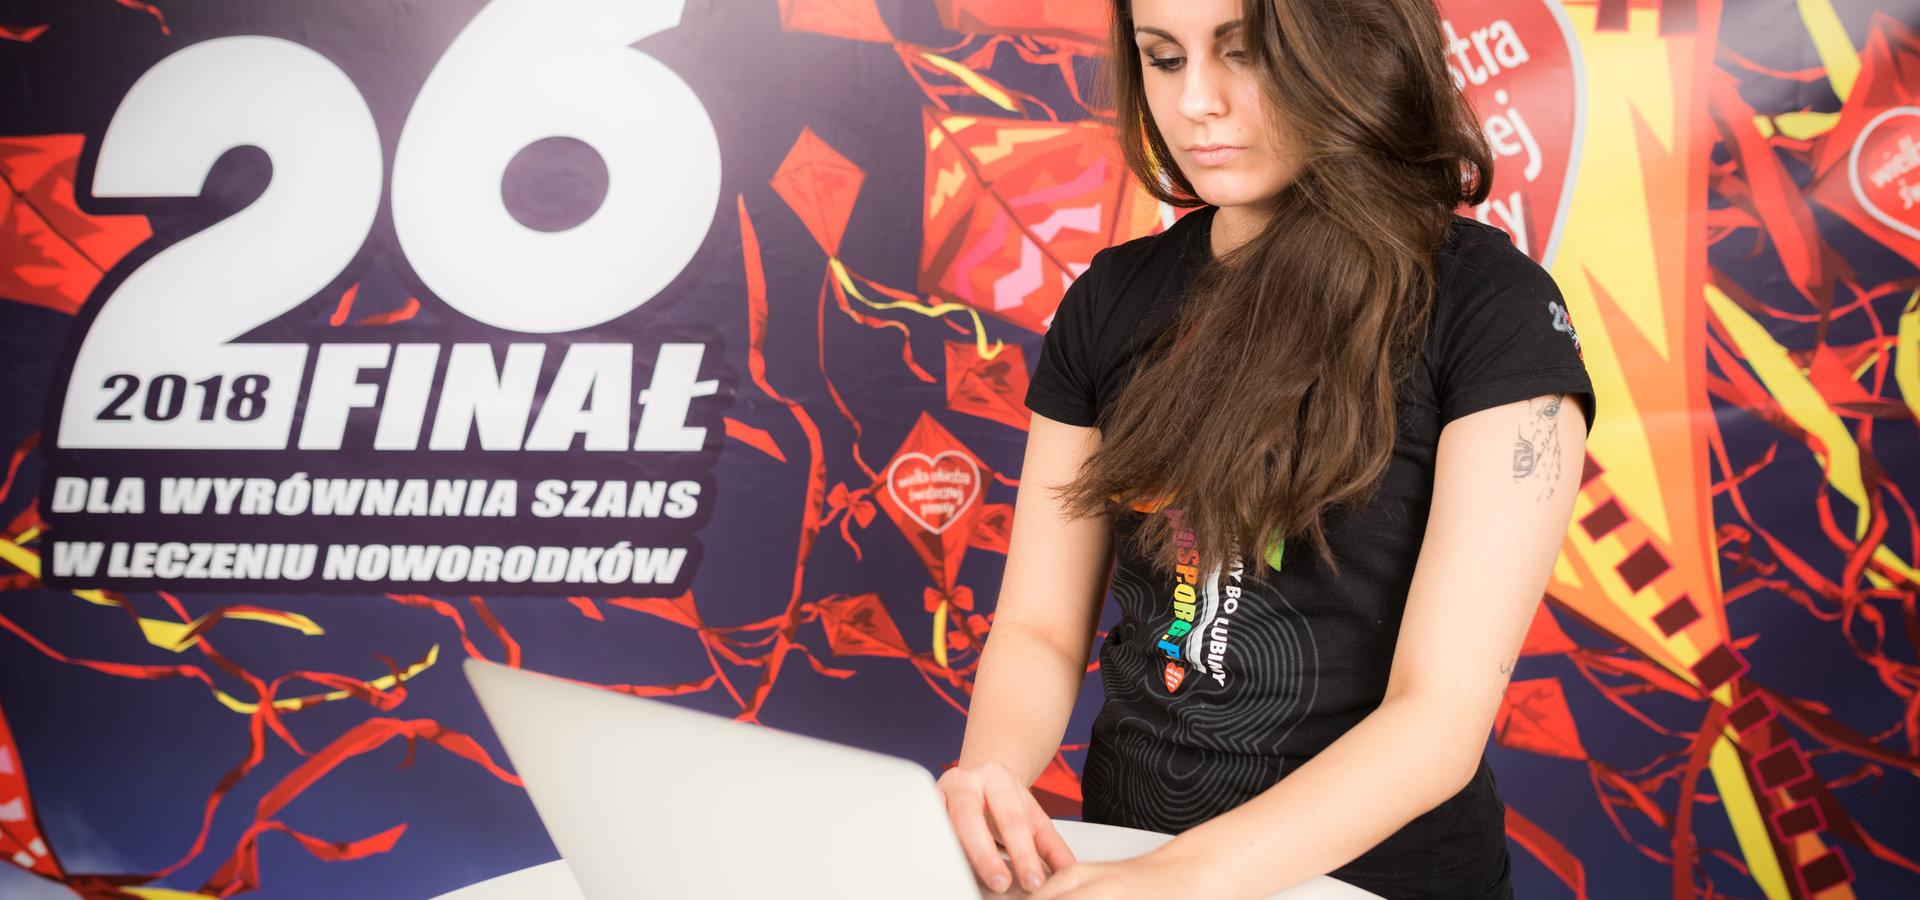 'Virtual Heart' beats for charity